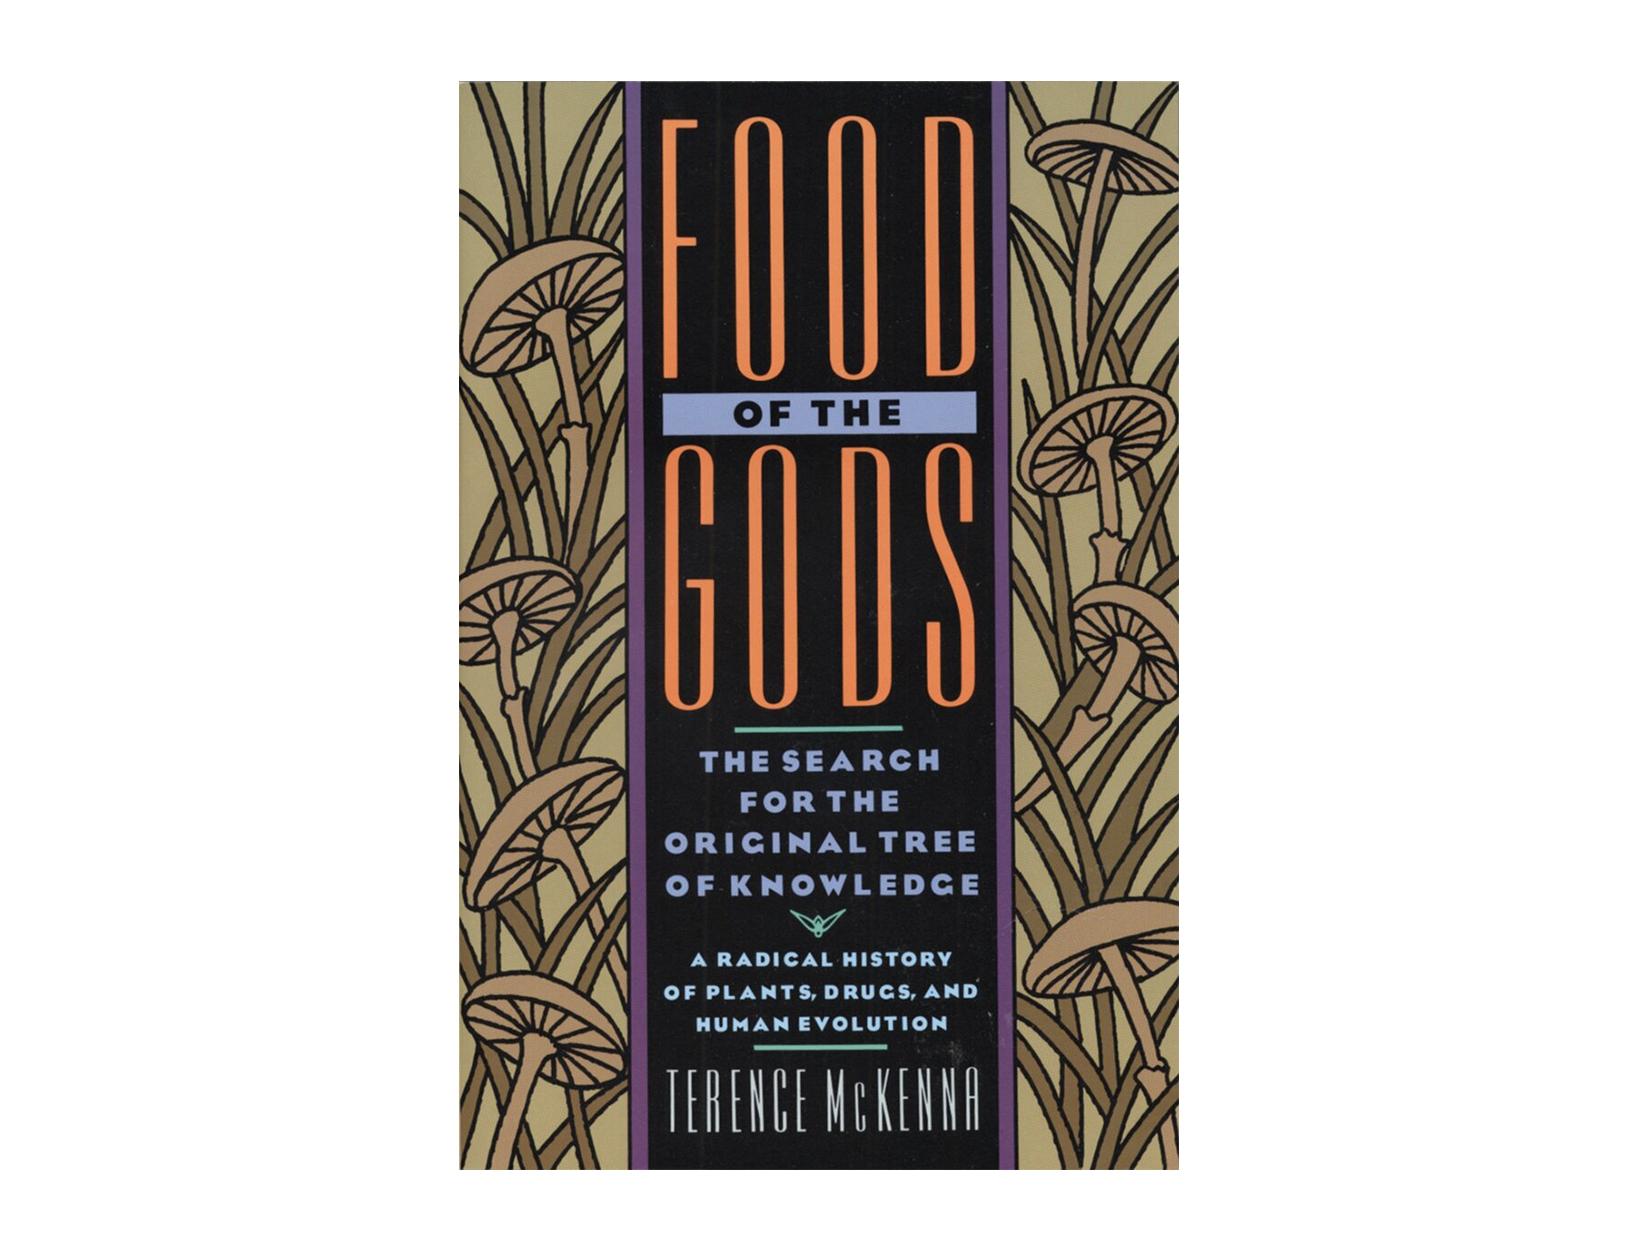 <em>Food of the Gods</em> by Terence McKenna